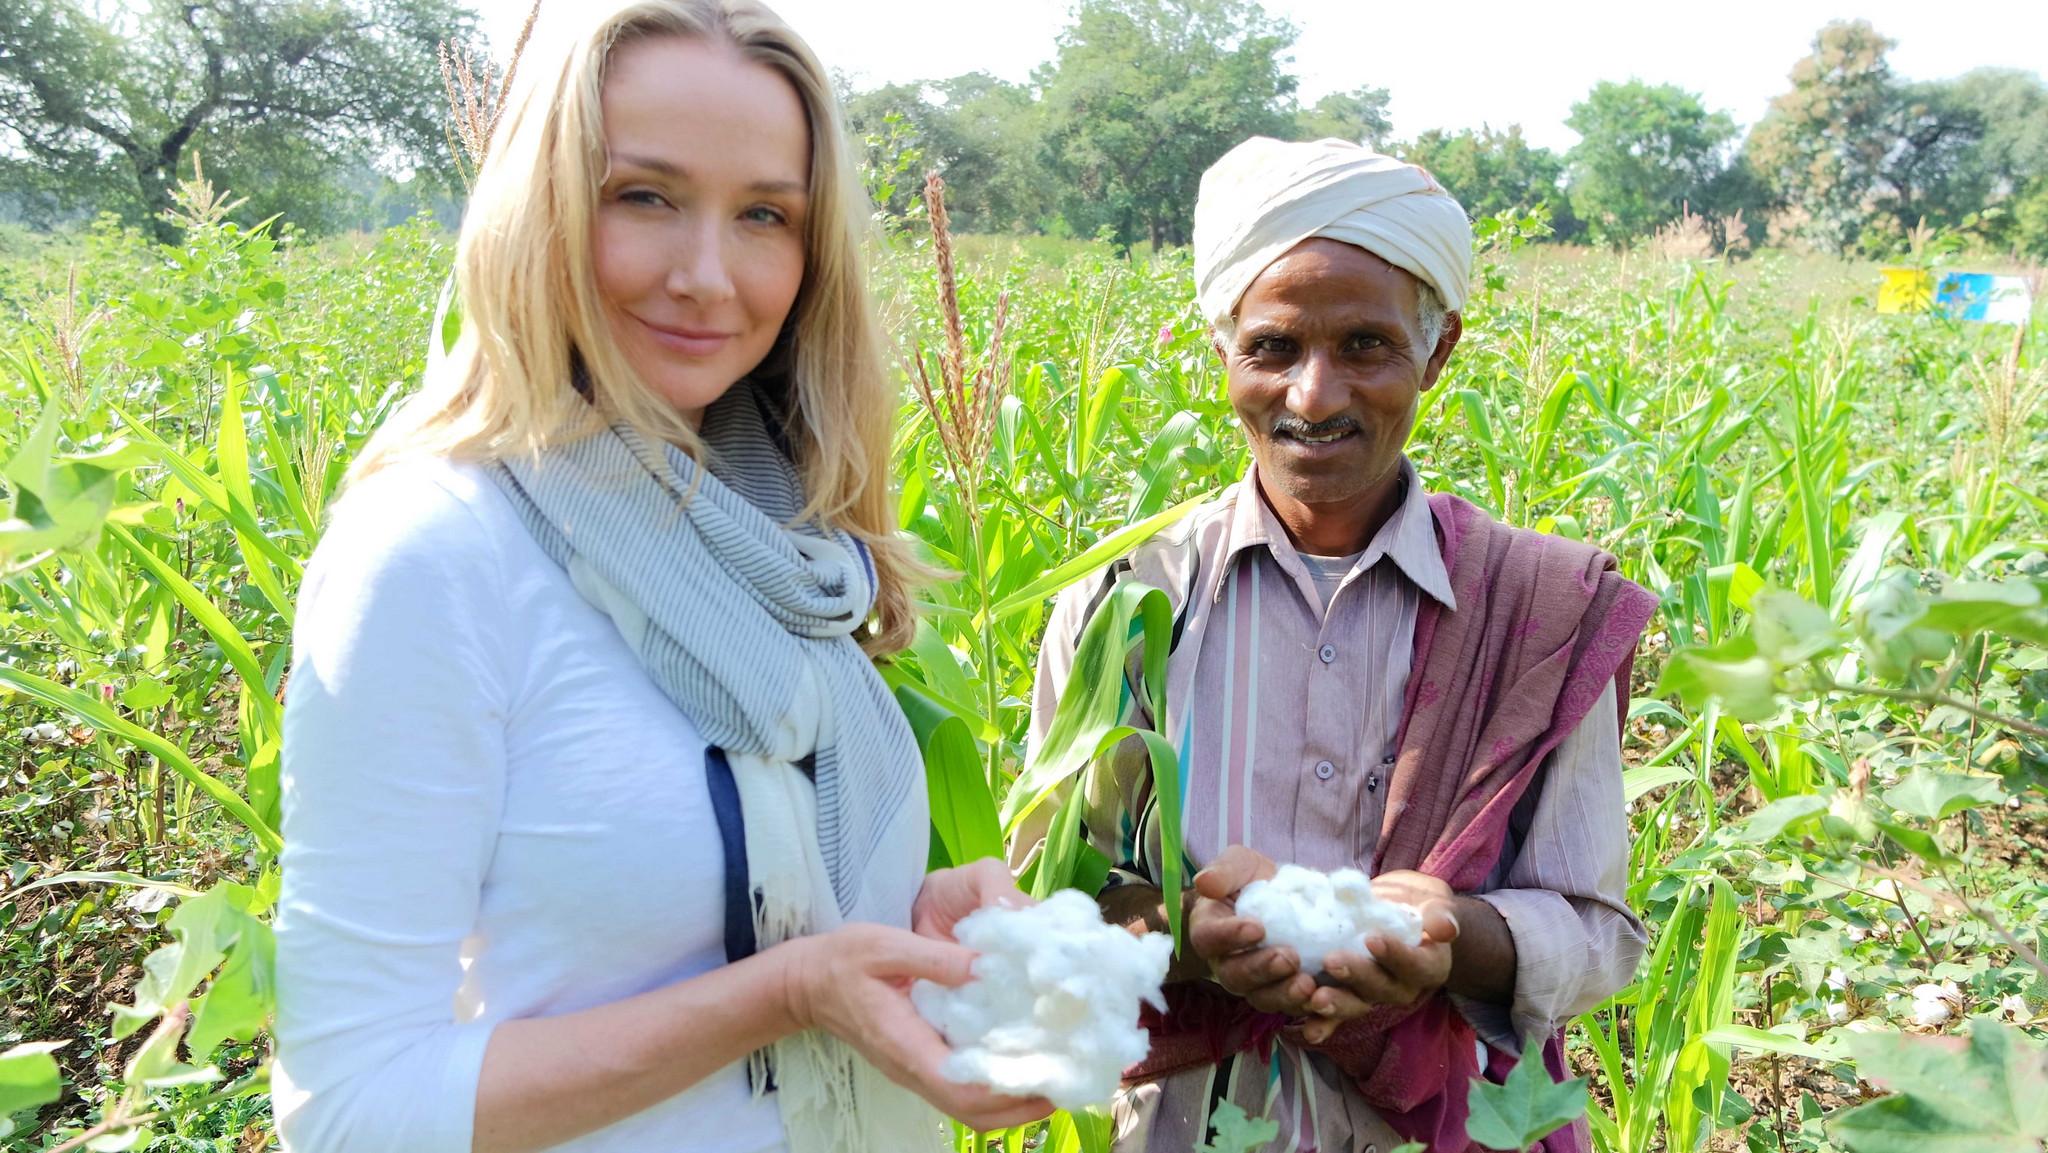 alexandra cousteau and organic cotton farmer shivlal jadha - 2015 mirella pappalardo.jpg